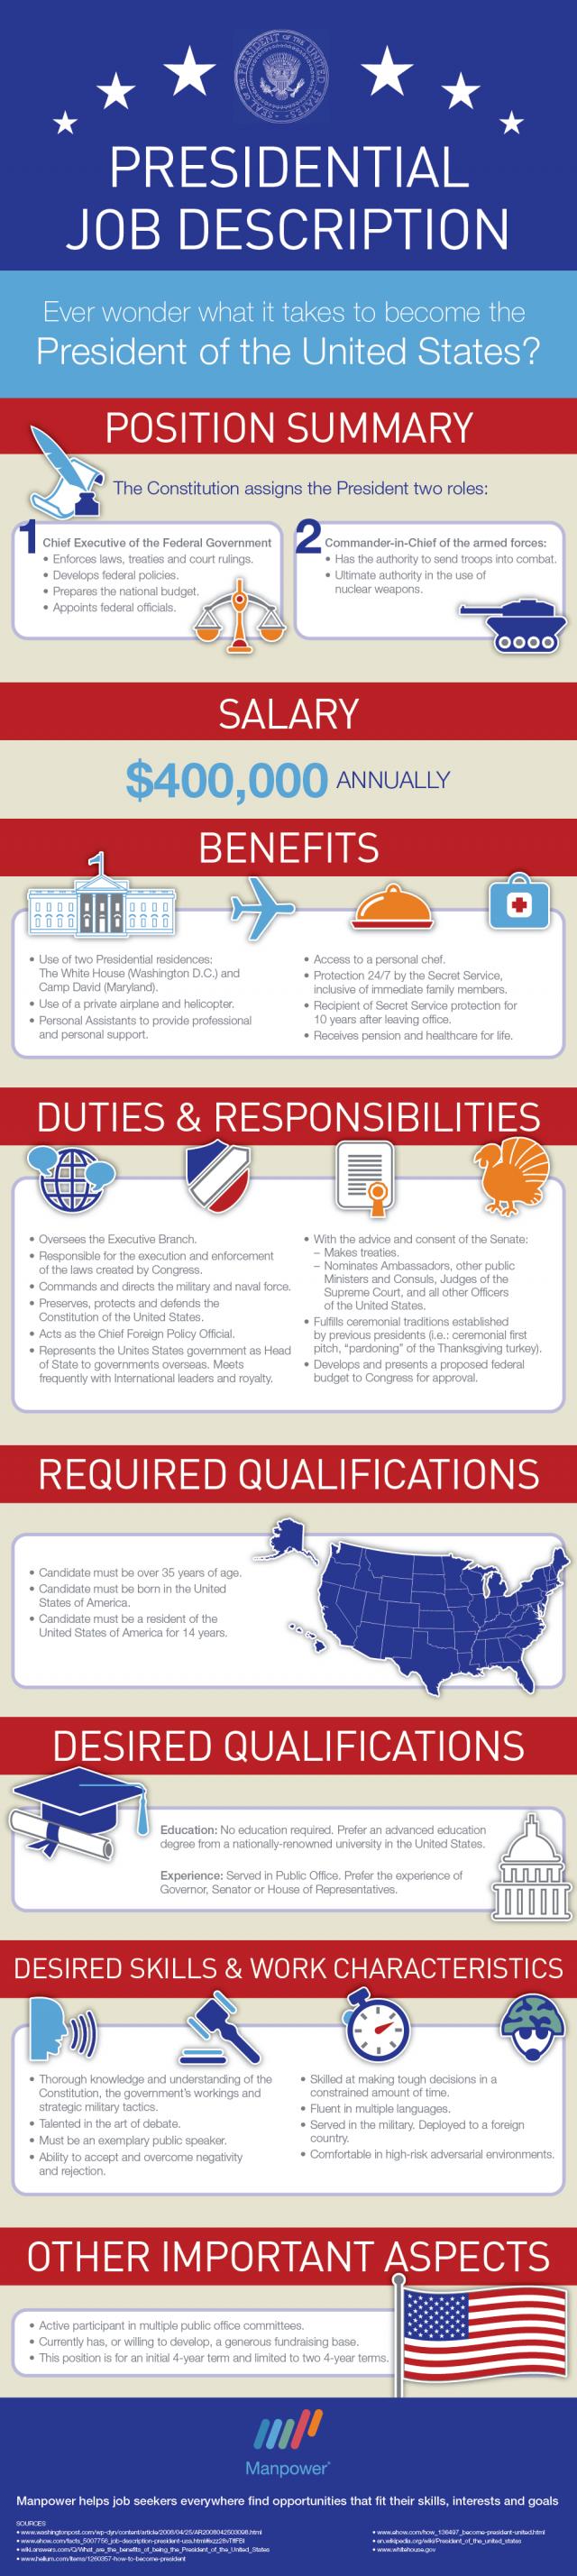 President and Vice President Job Descriptions #presidents